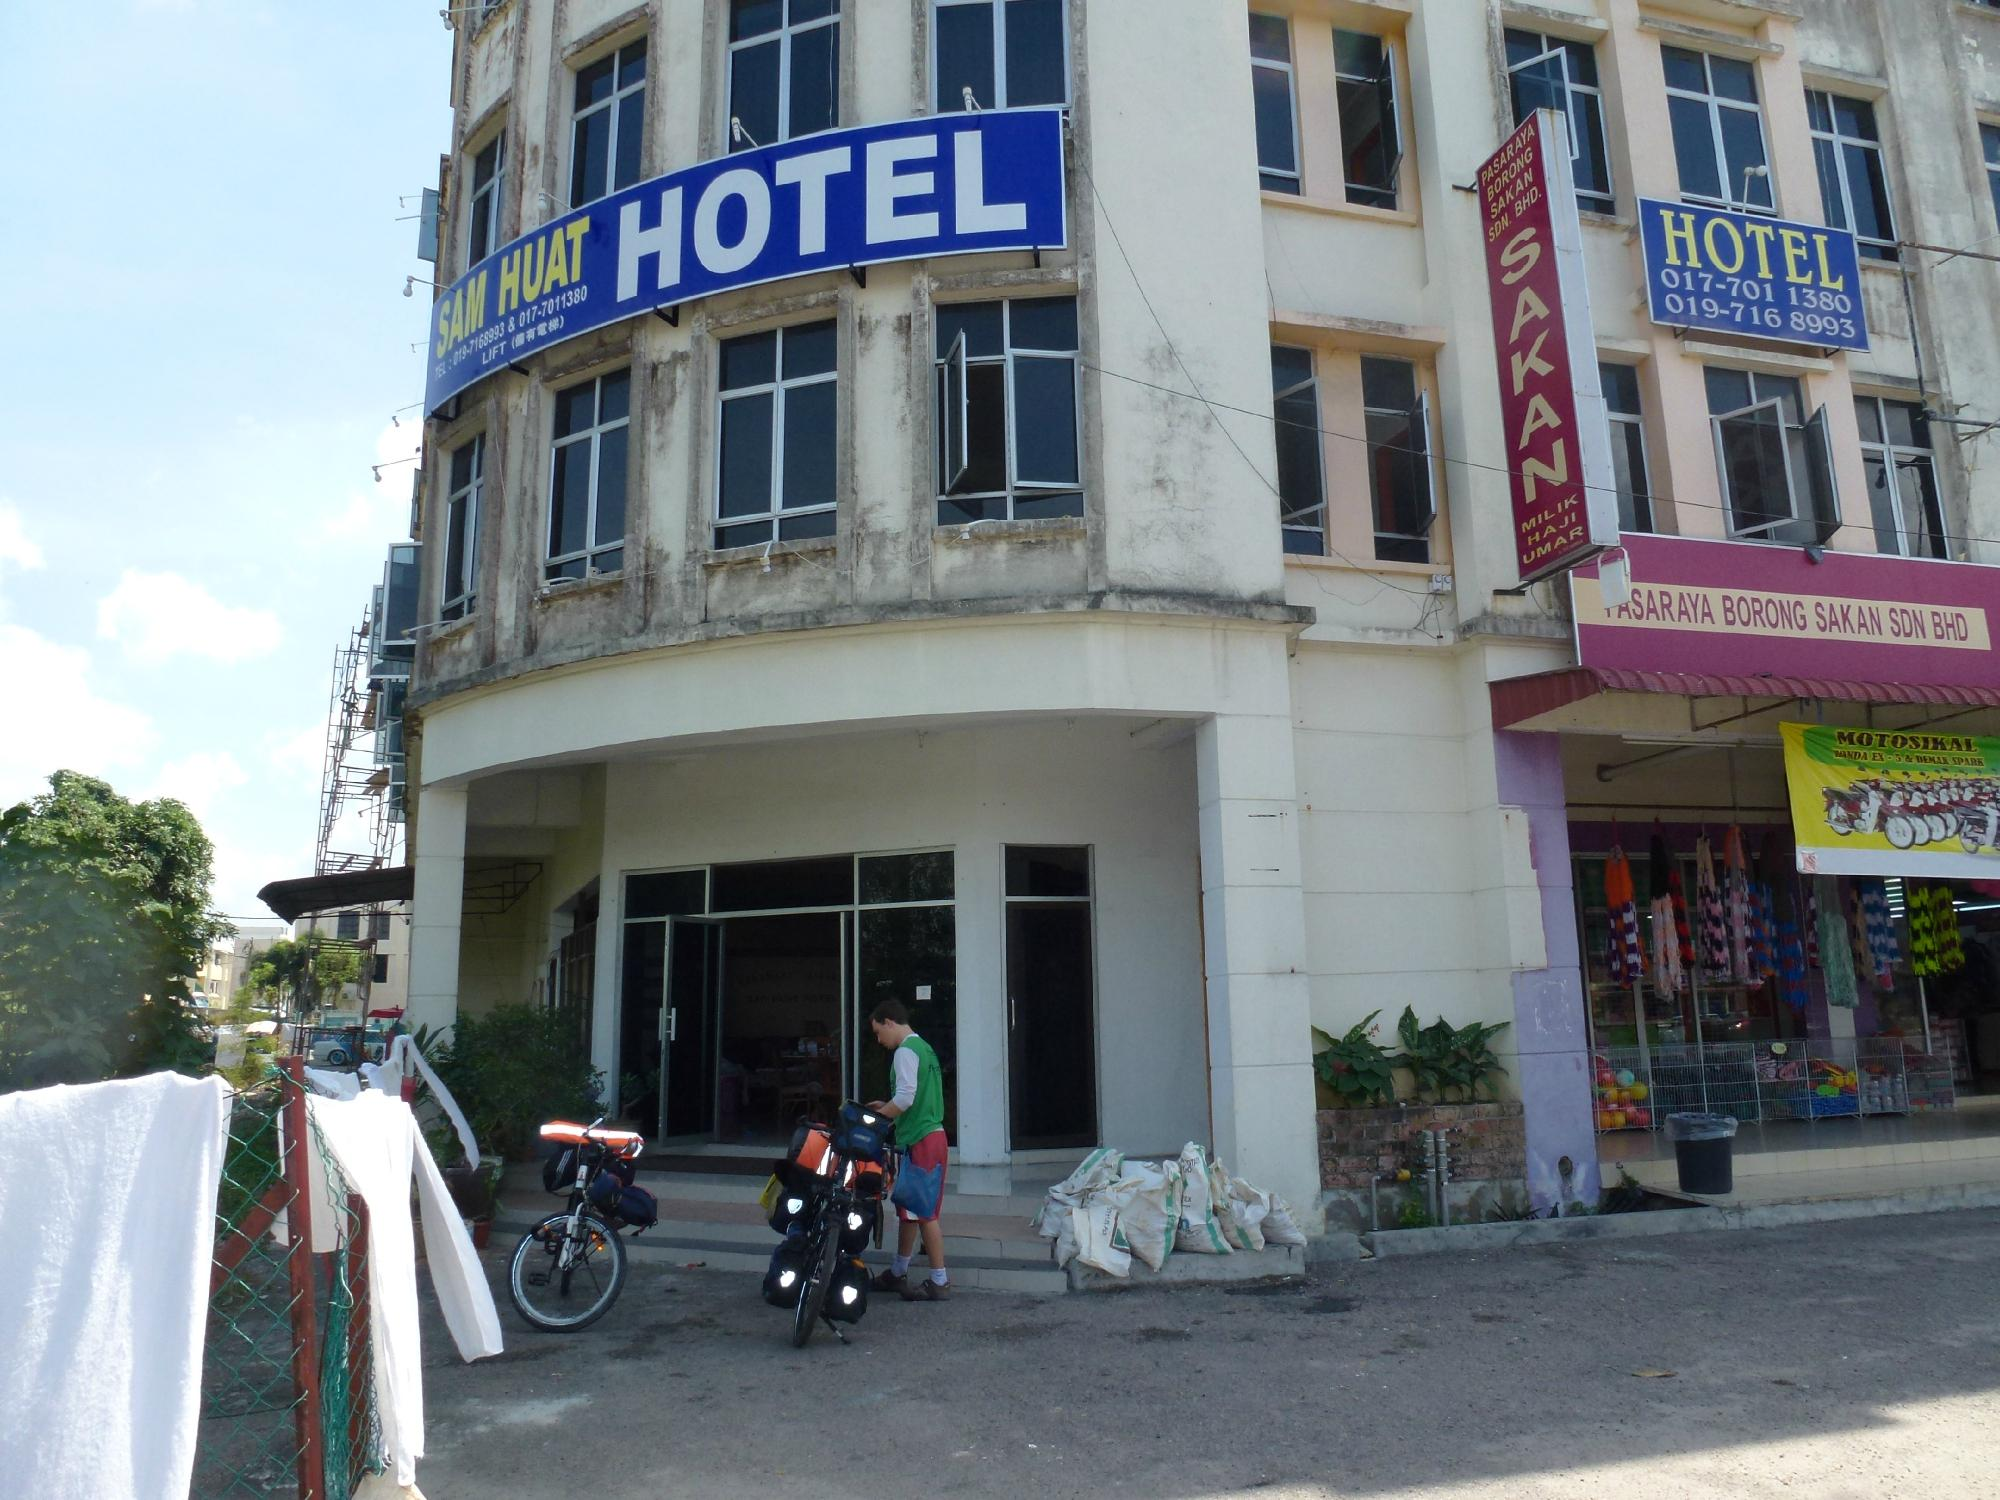 Sam Huat Hotel